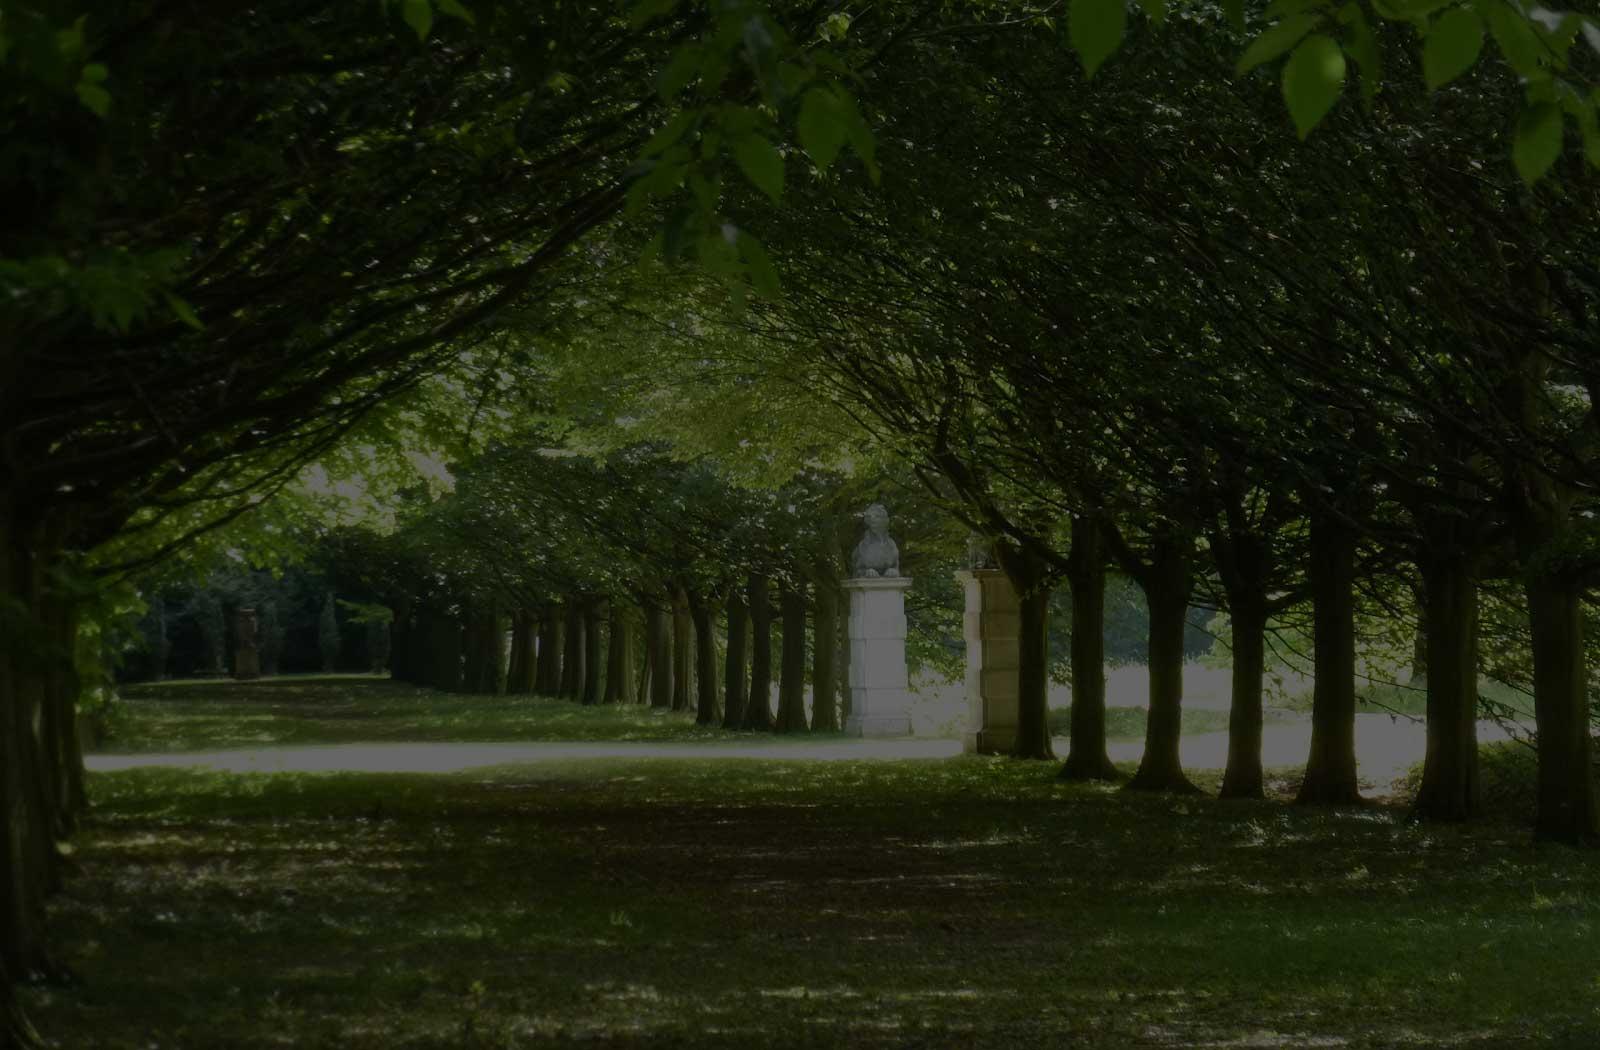 AB Tree Care